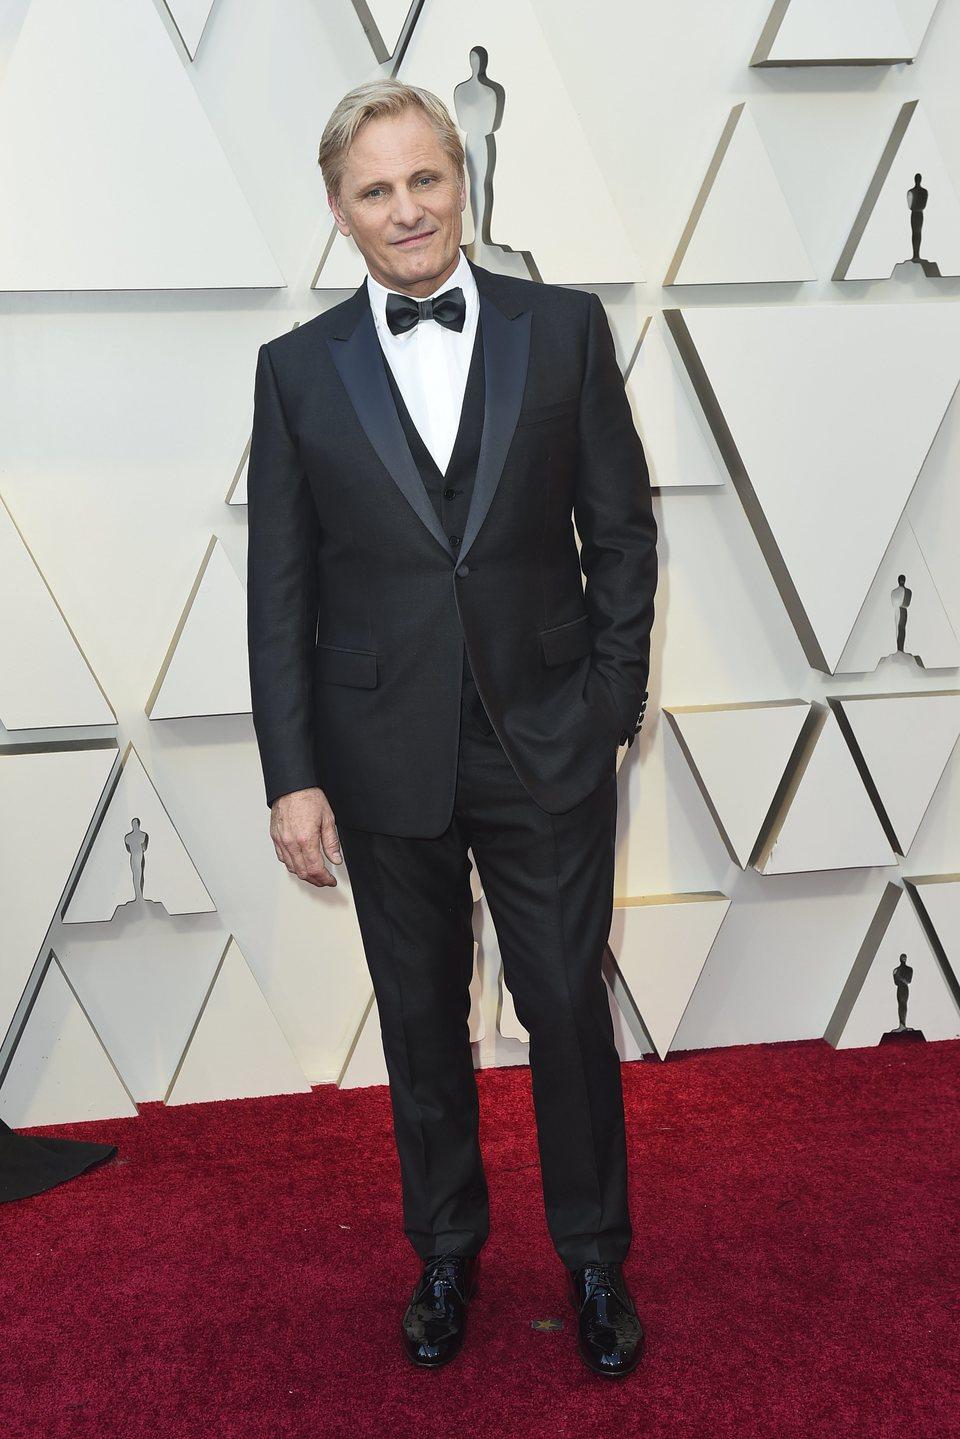 Viggo Mortensen on the red carpet at the Oscars 2019